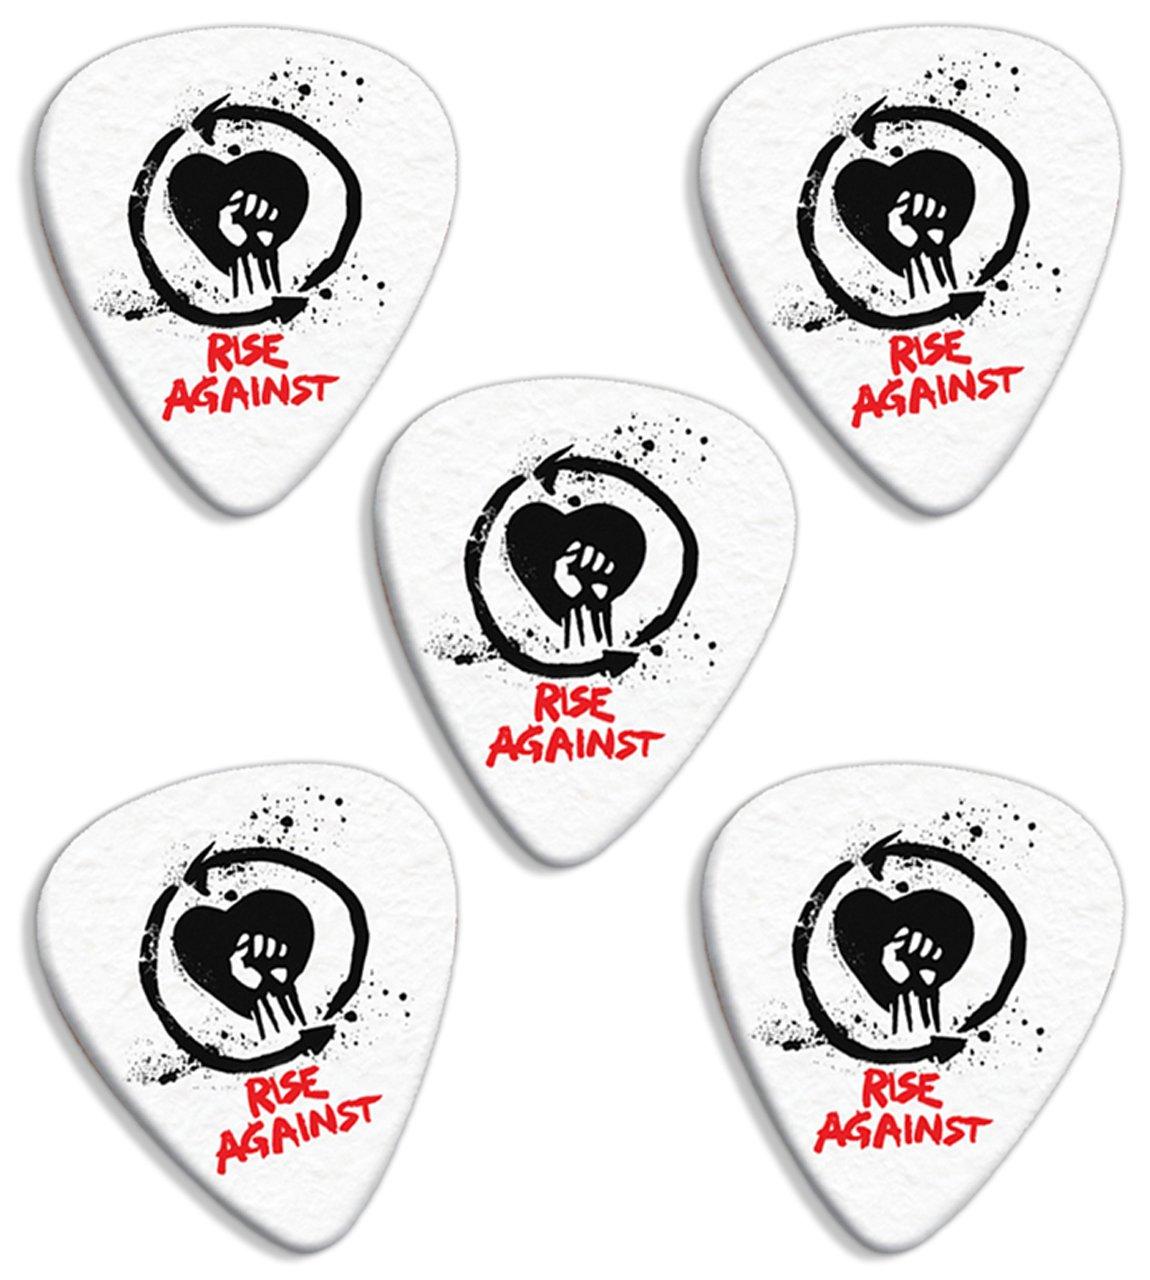 Rise Against ( Classic Logo Range) Premium Gitarre Plektrum Plektron Picks x 5 Printed Guitarra Picks